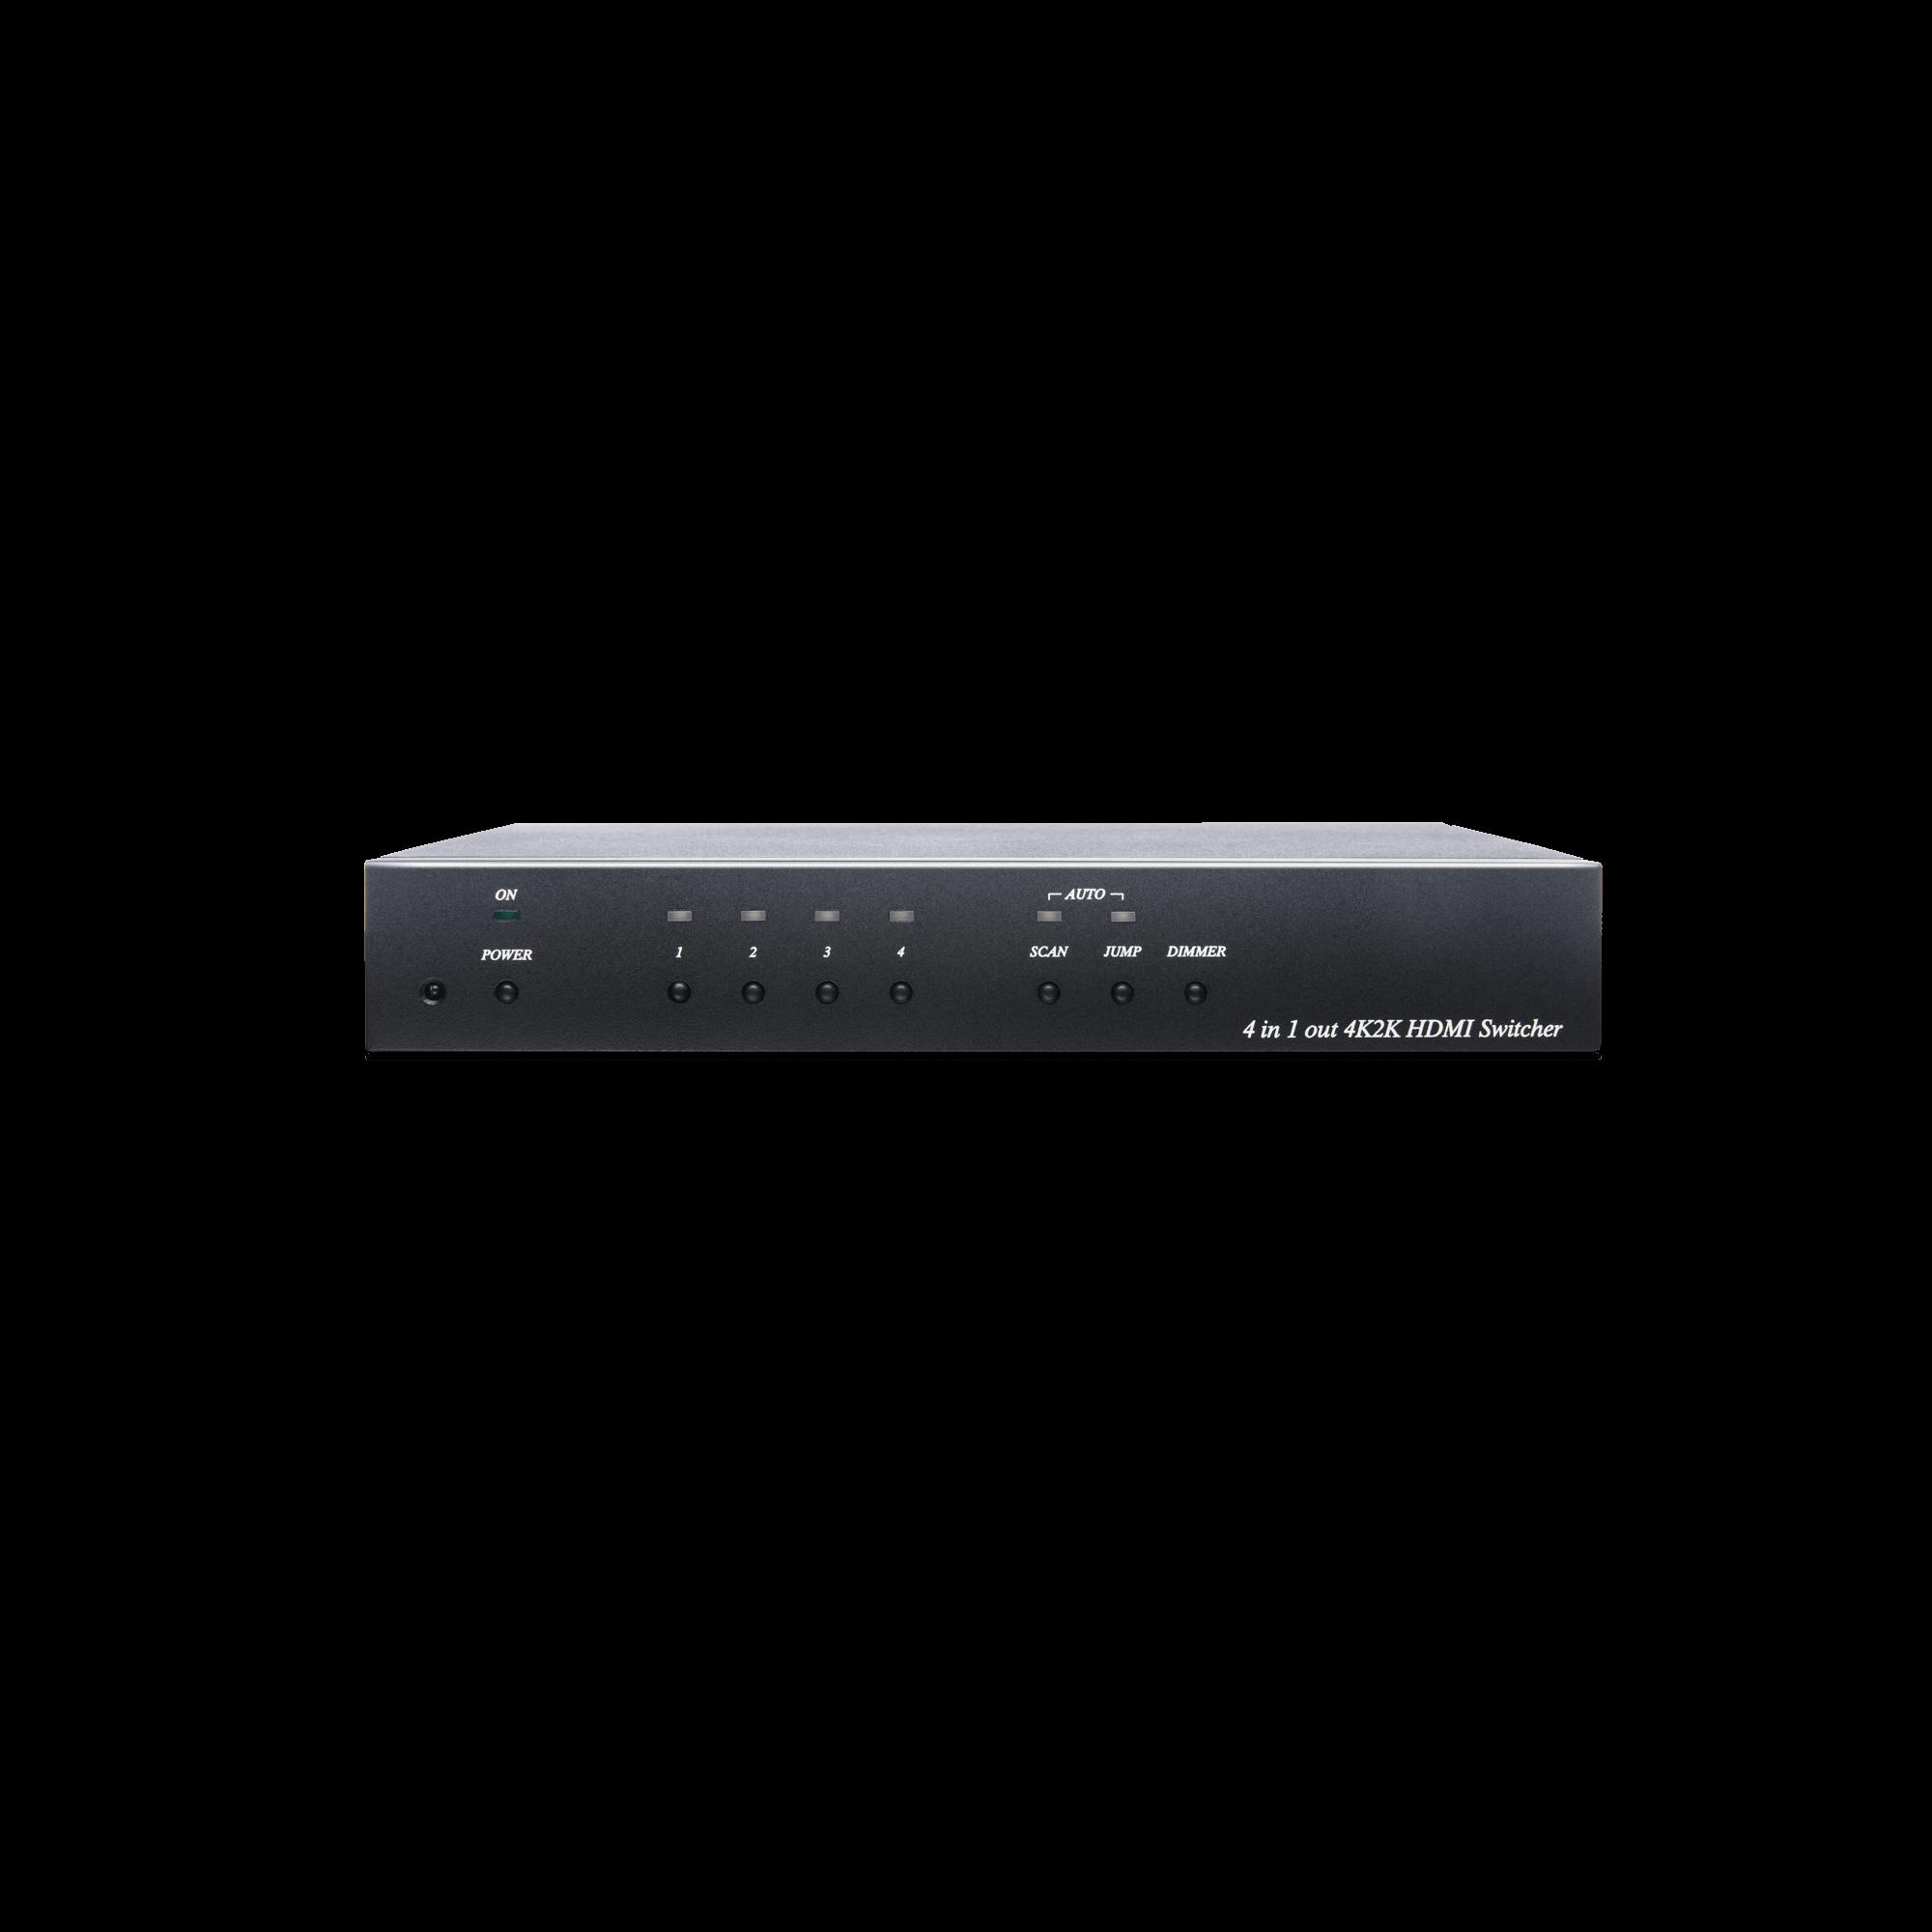 4K 60Hz 4 x 1 HDMI Switcher